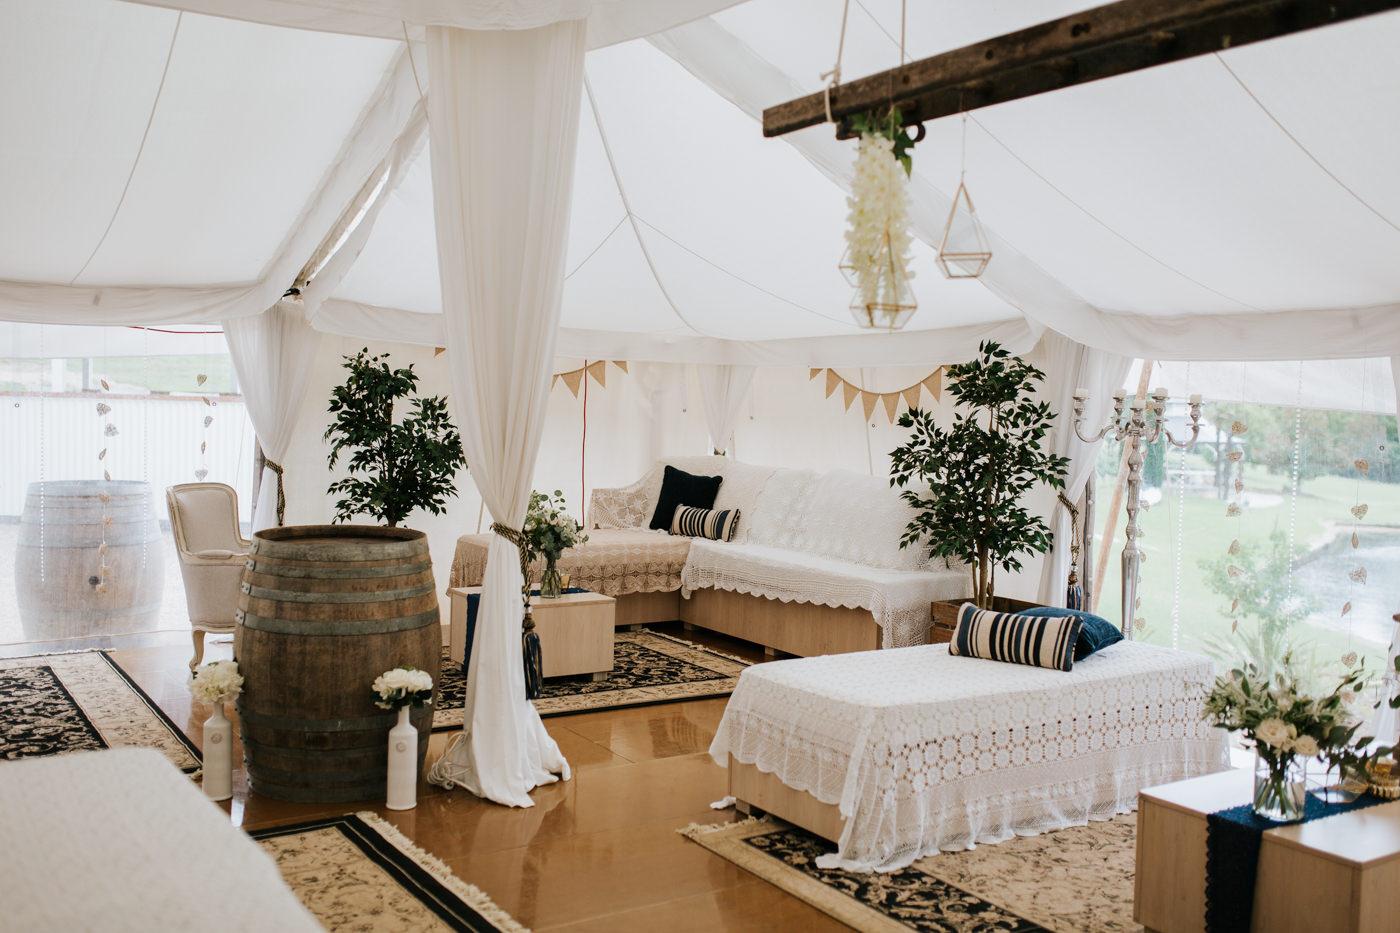 Nick & Vanezza - Fernbank Farm Wedding - Samantha Heather Photography-44.jpg